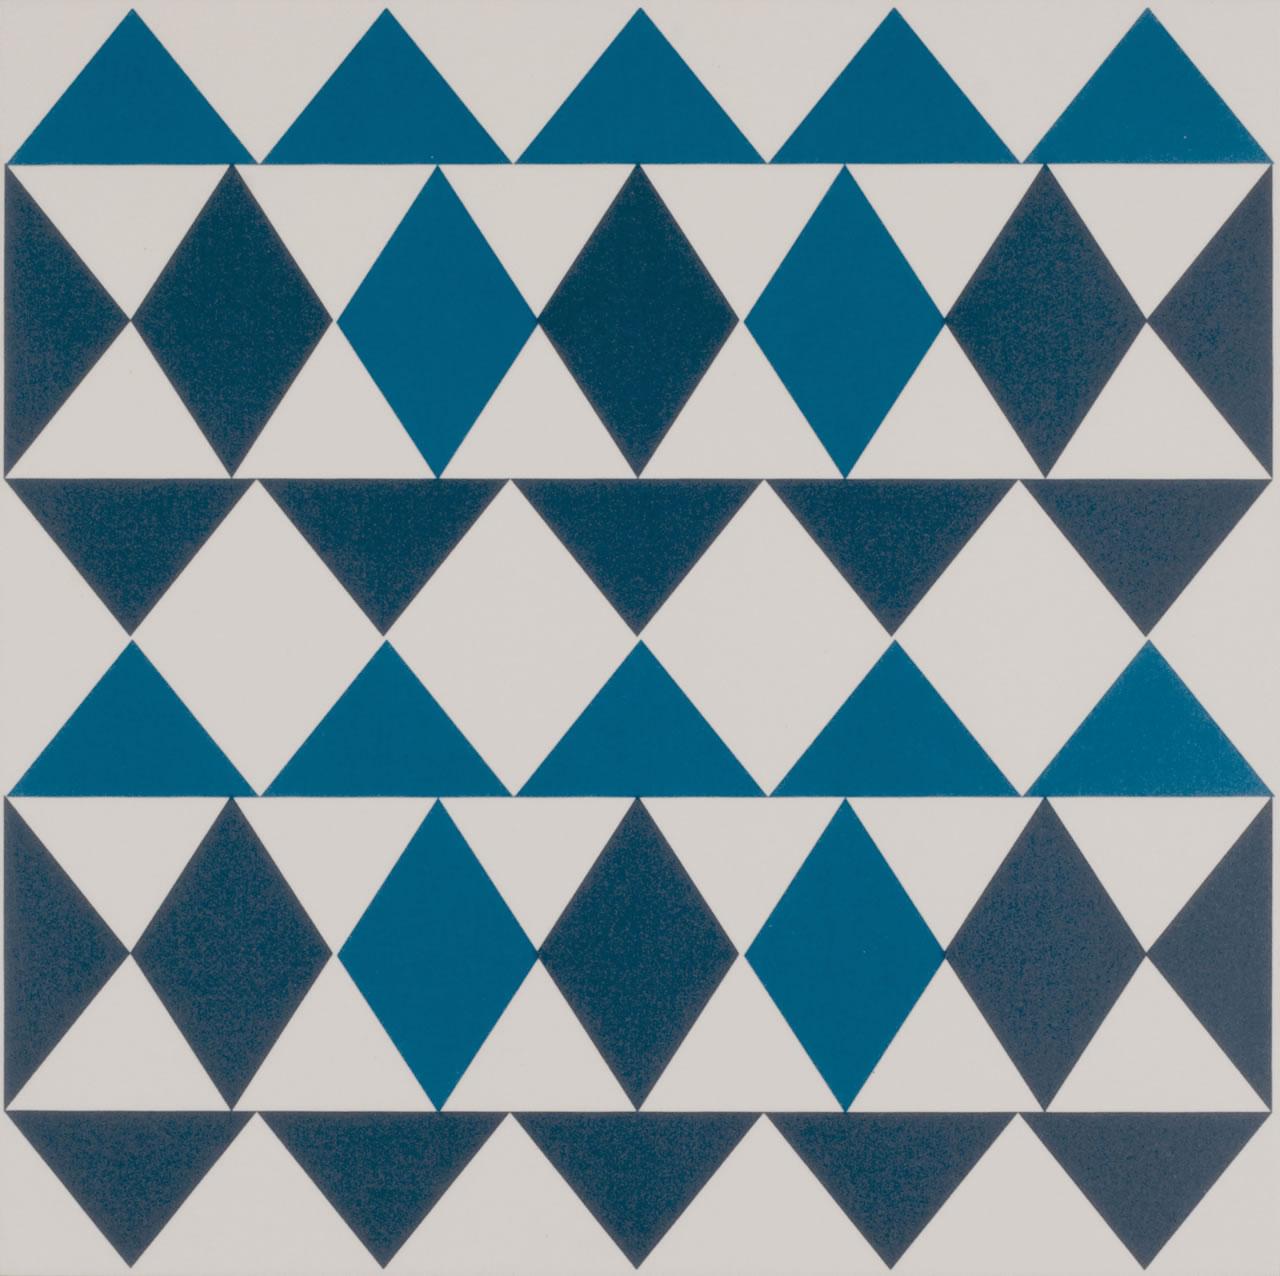 patchwork geométrico ac